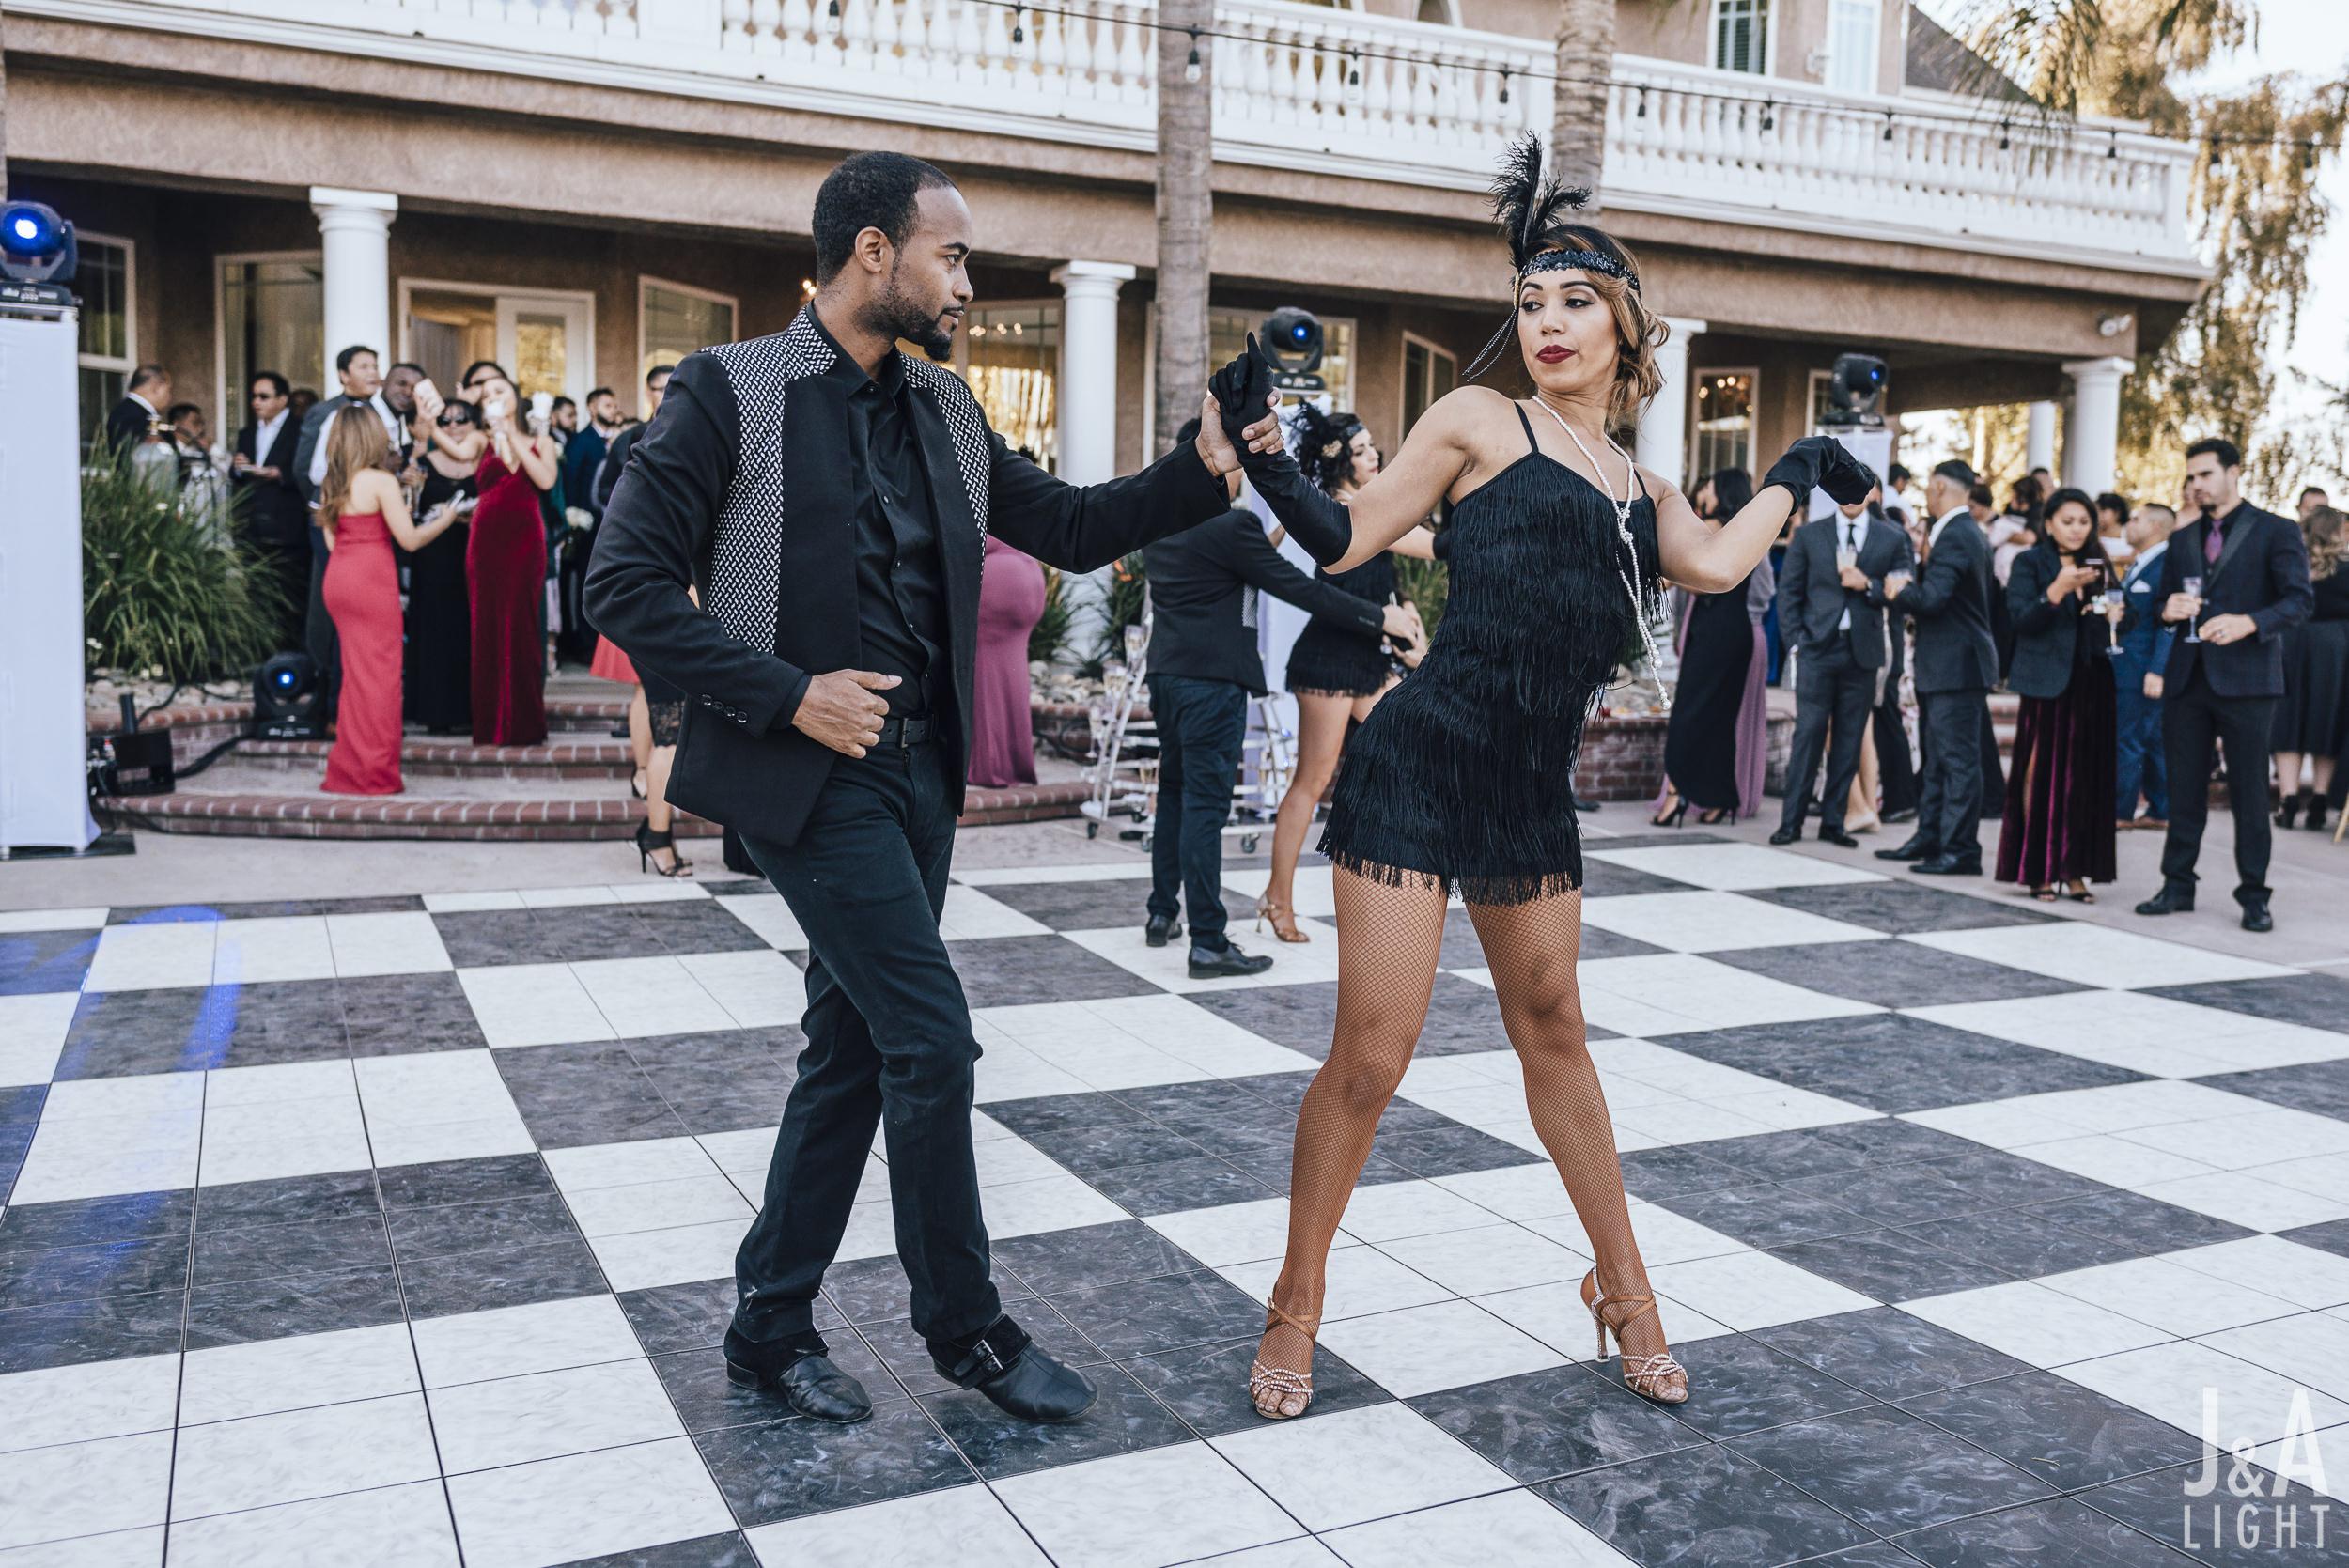 20171014-JanDan-LosBanos-GlassMansion-Wedding-Blog-053.jpg